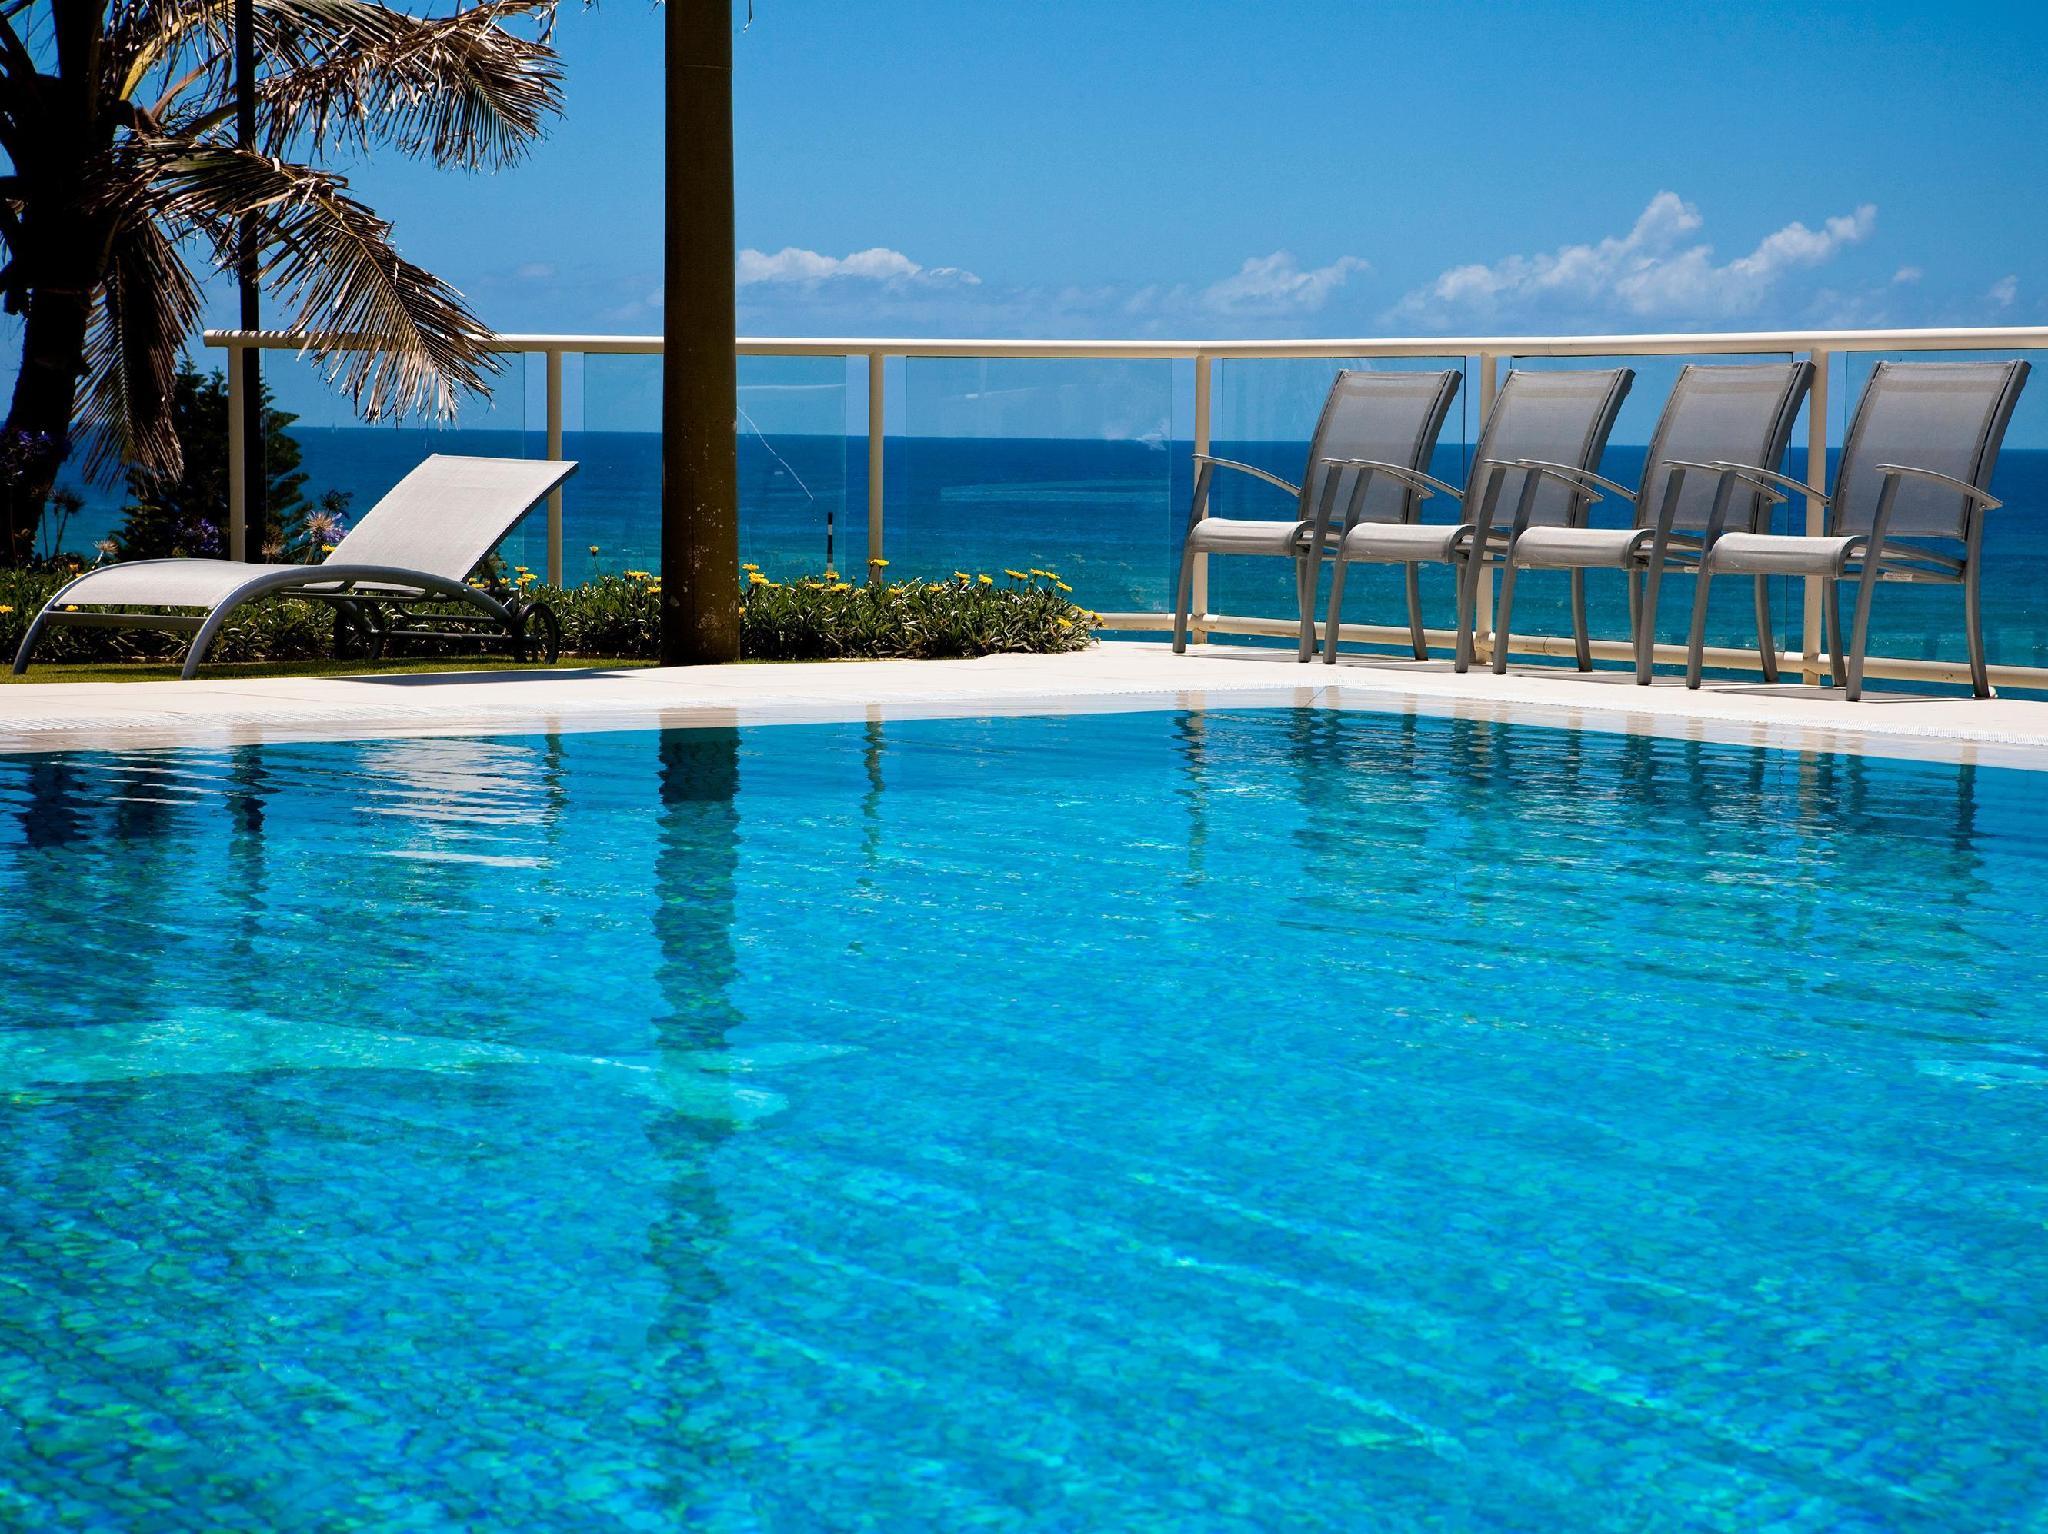 Swimming Pool Paradise Centre Apartments